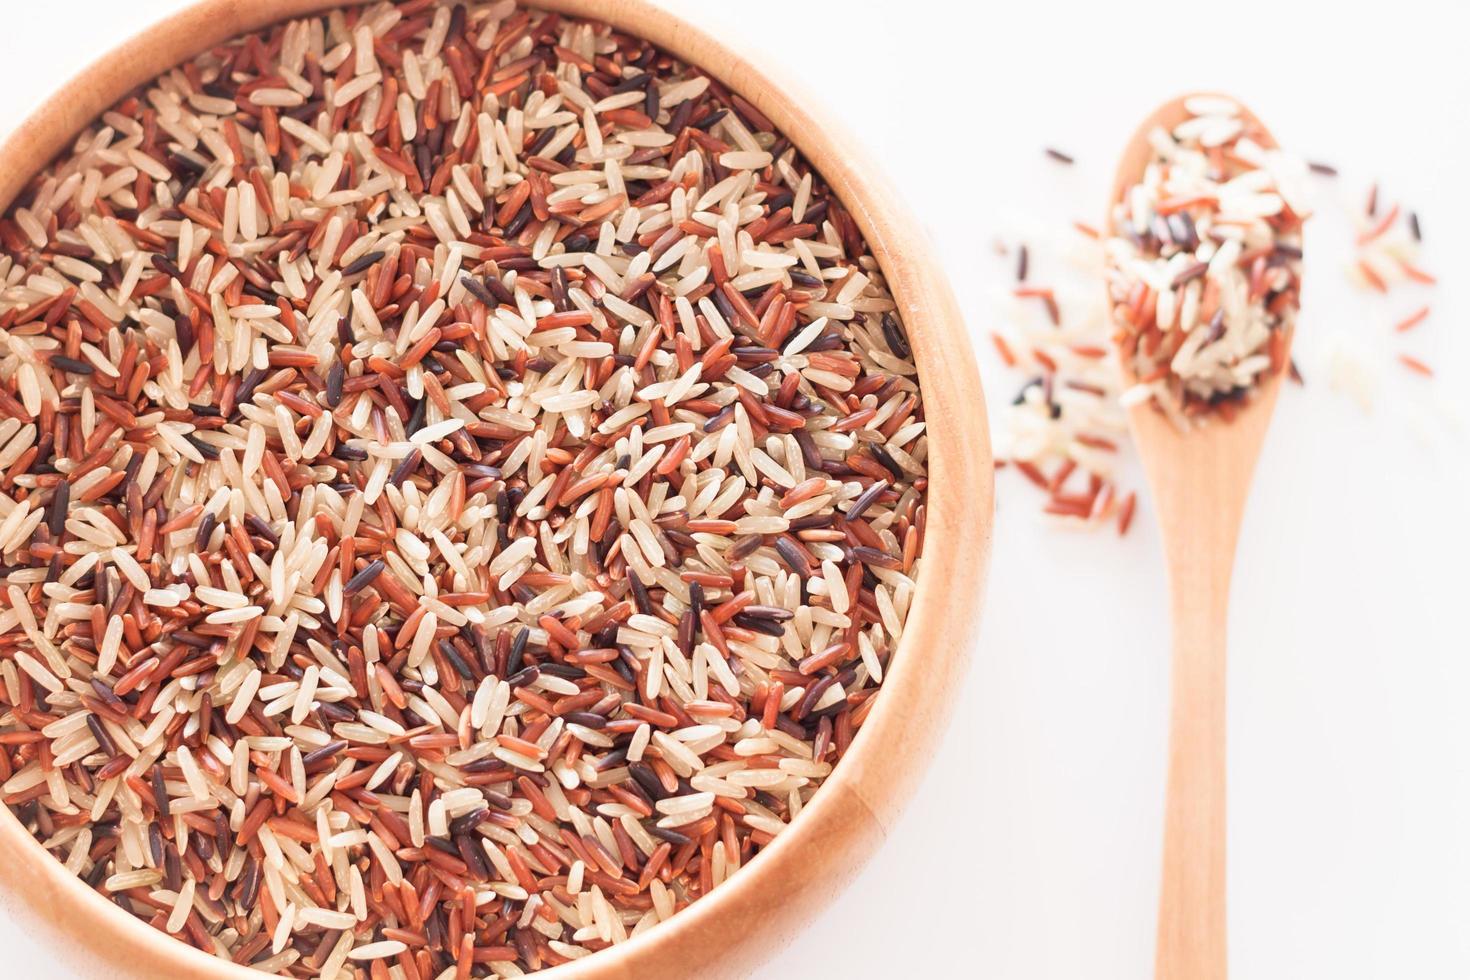 riz dans un bol en bois photo